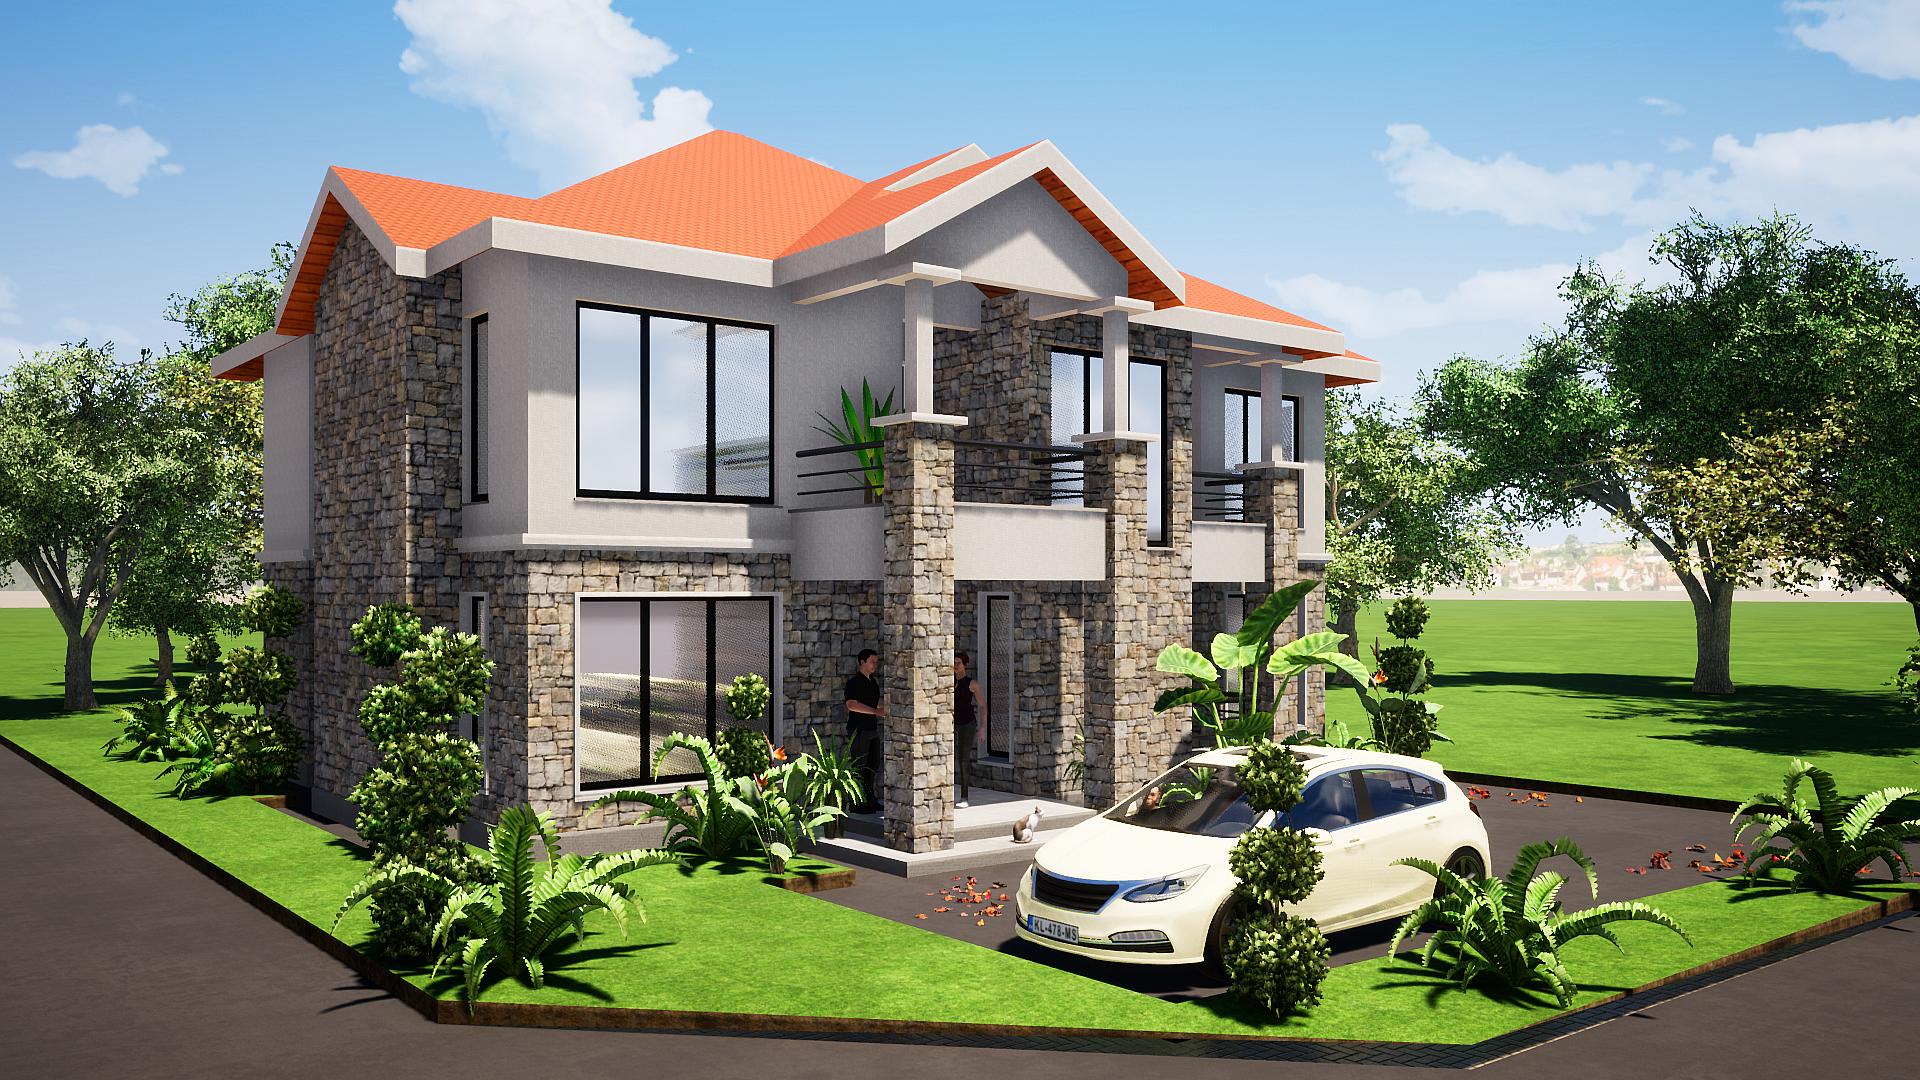 4 Bedroom Maisonette House Plan Muthurwa Com In 2020 Architectural House Plans House Plans Simple House Plans